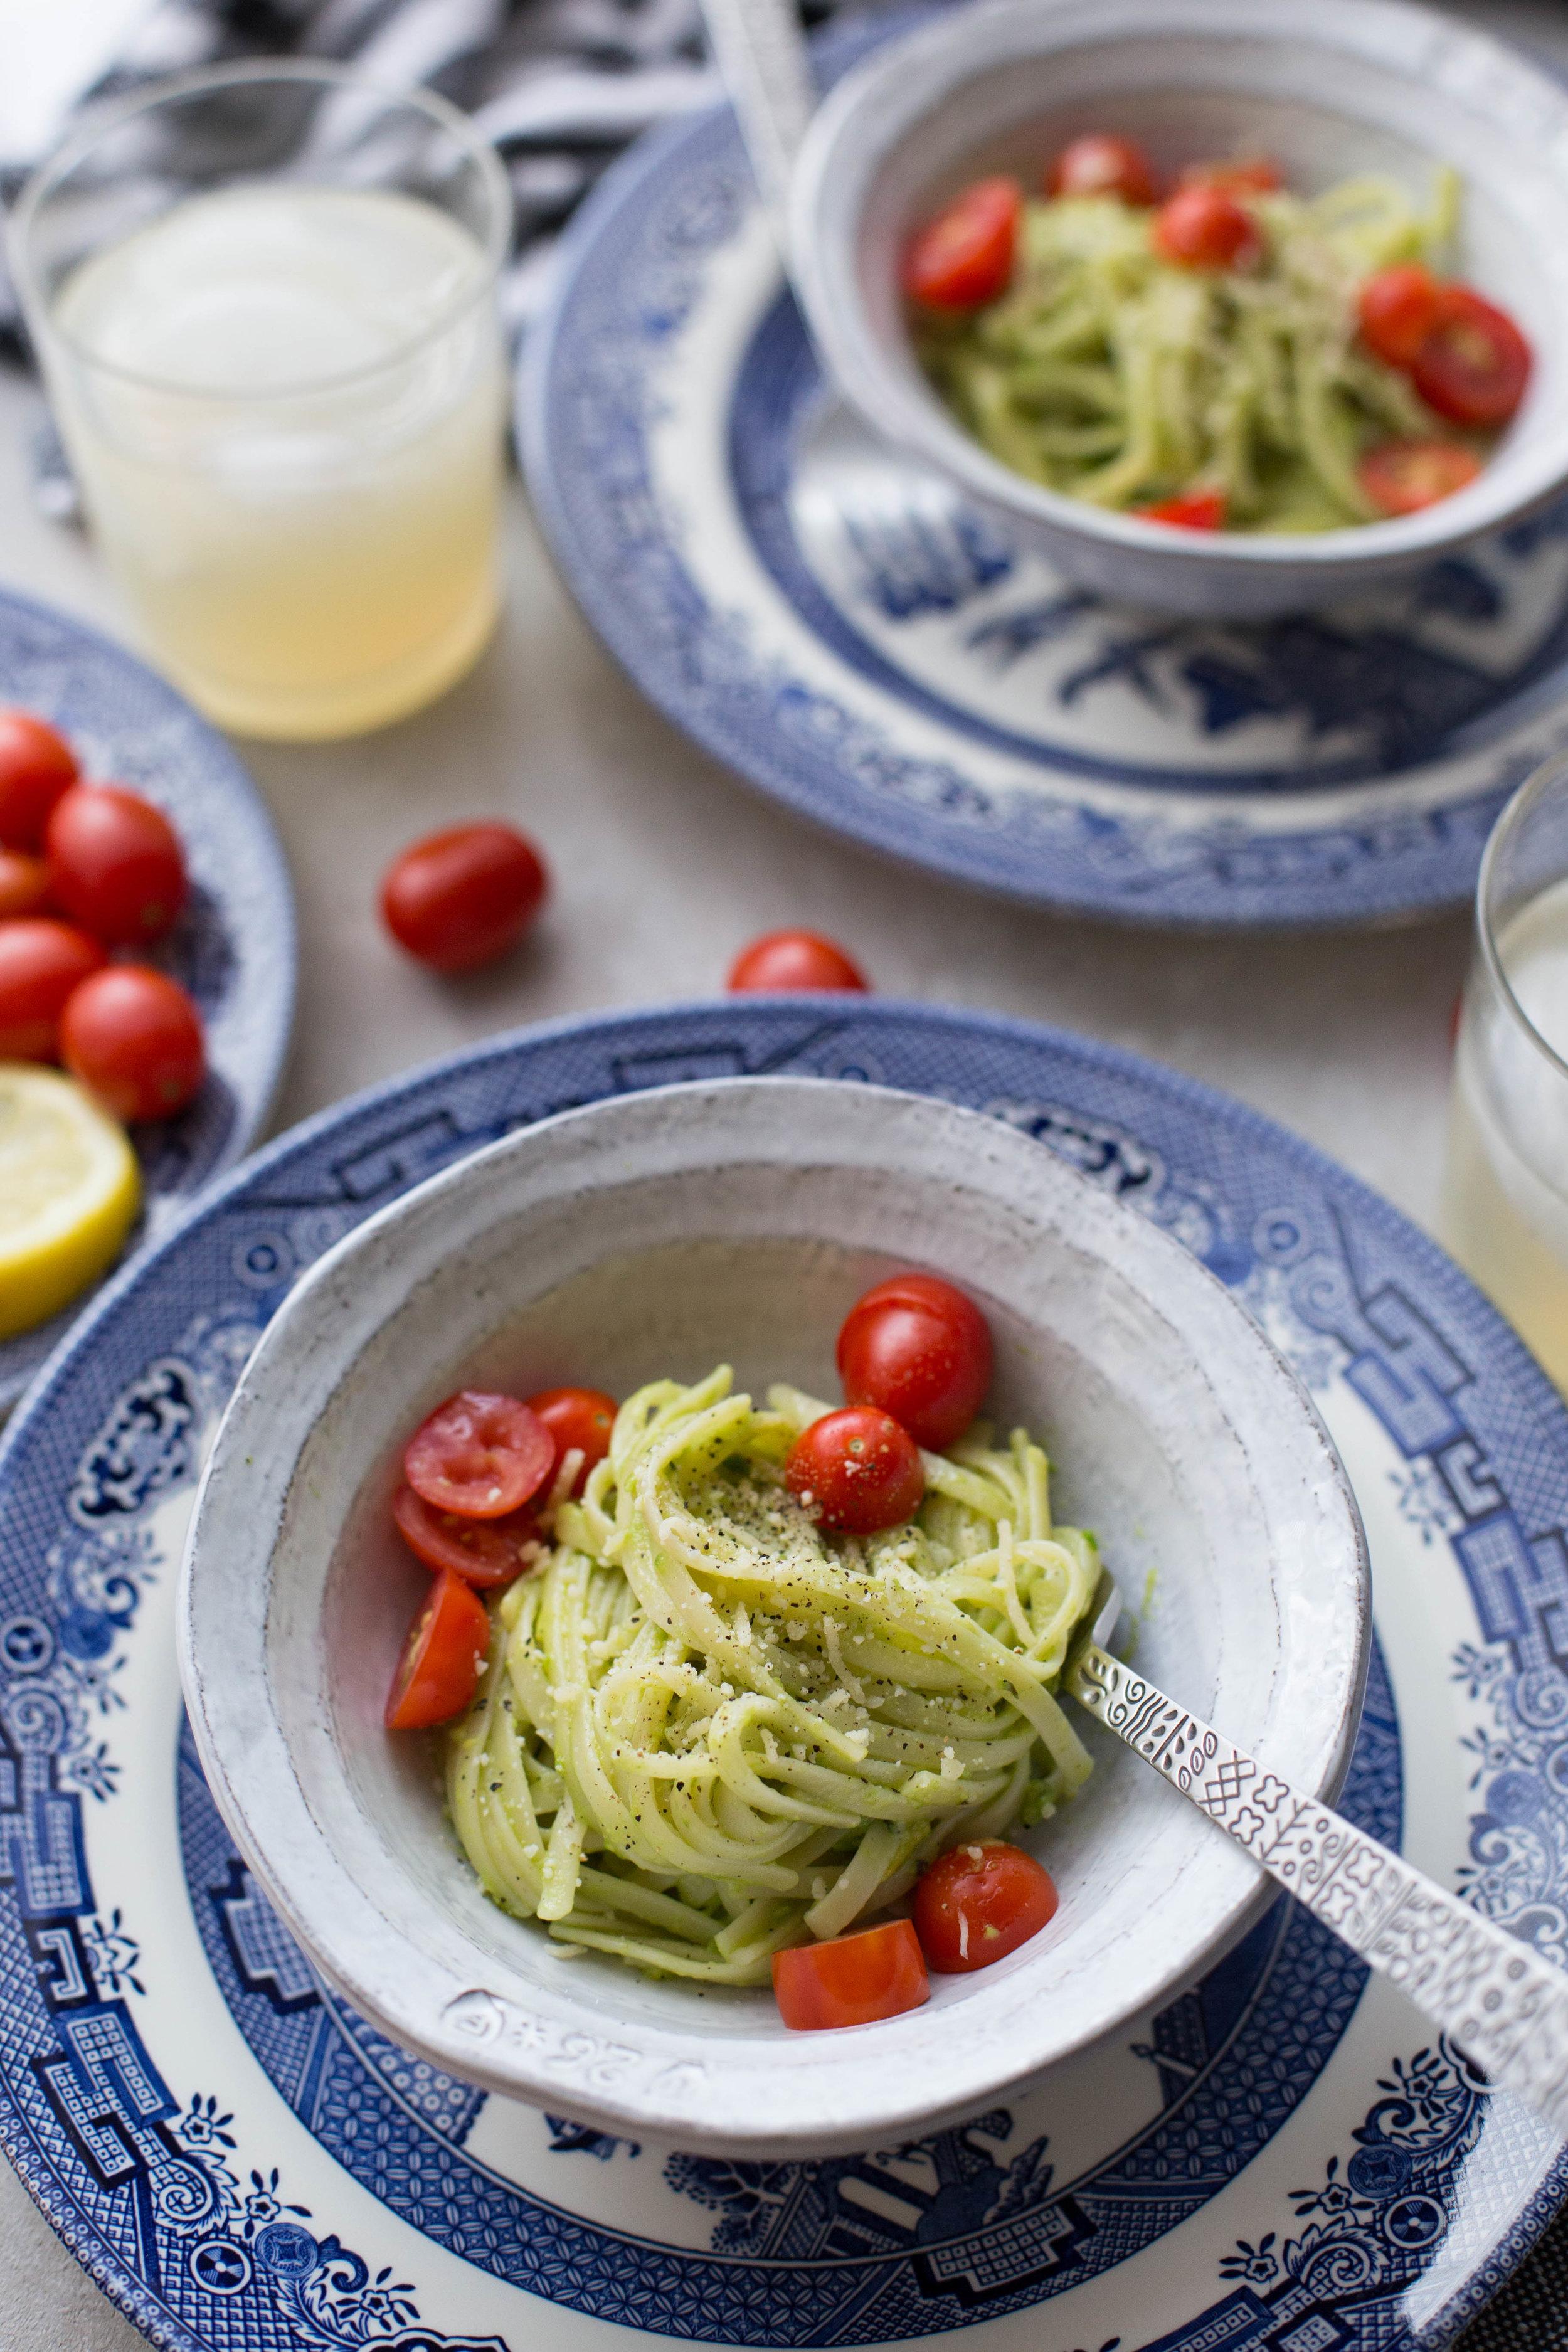 Creamy Avocado and Lemon Pasta